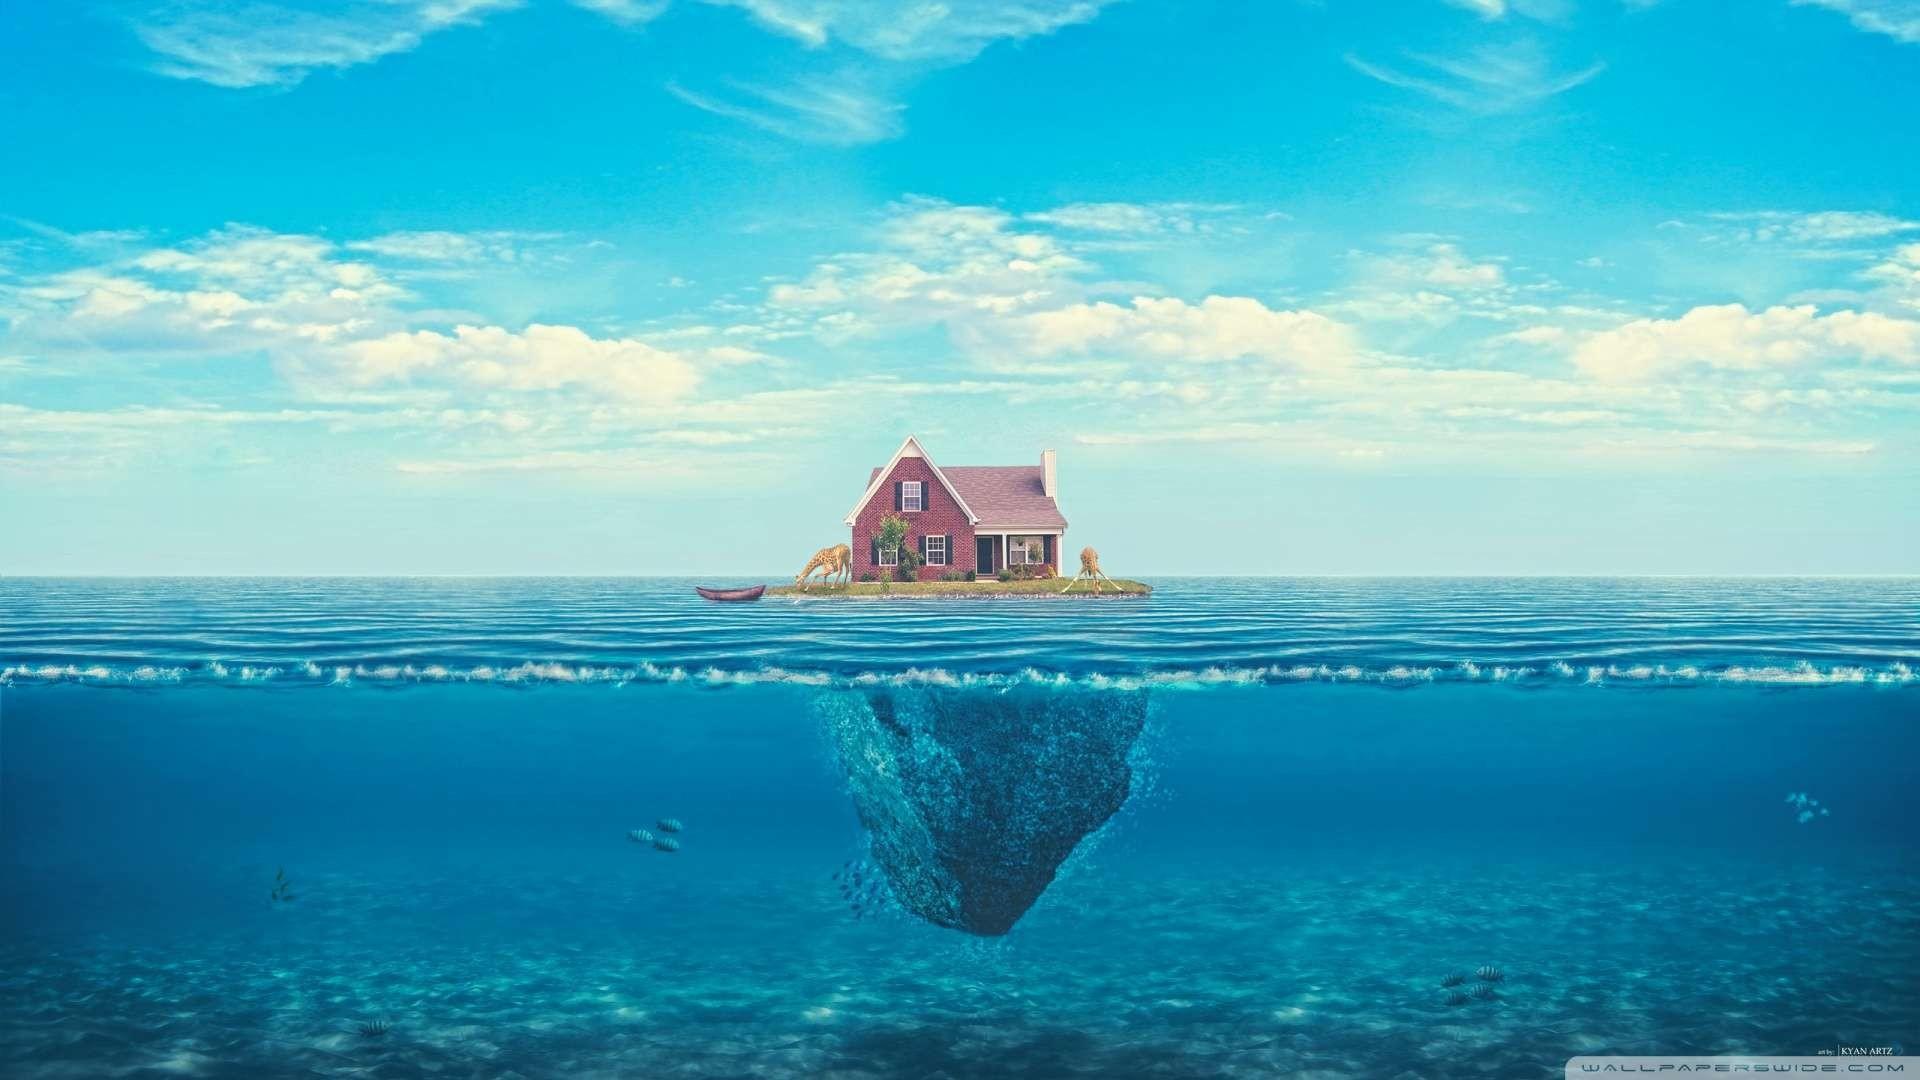 Wallpaper: House On The Ocean Wallpaper 1080p HD. Upload at December .